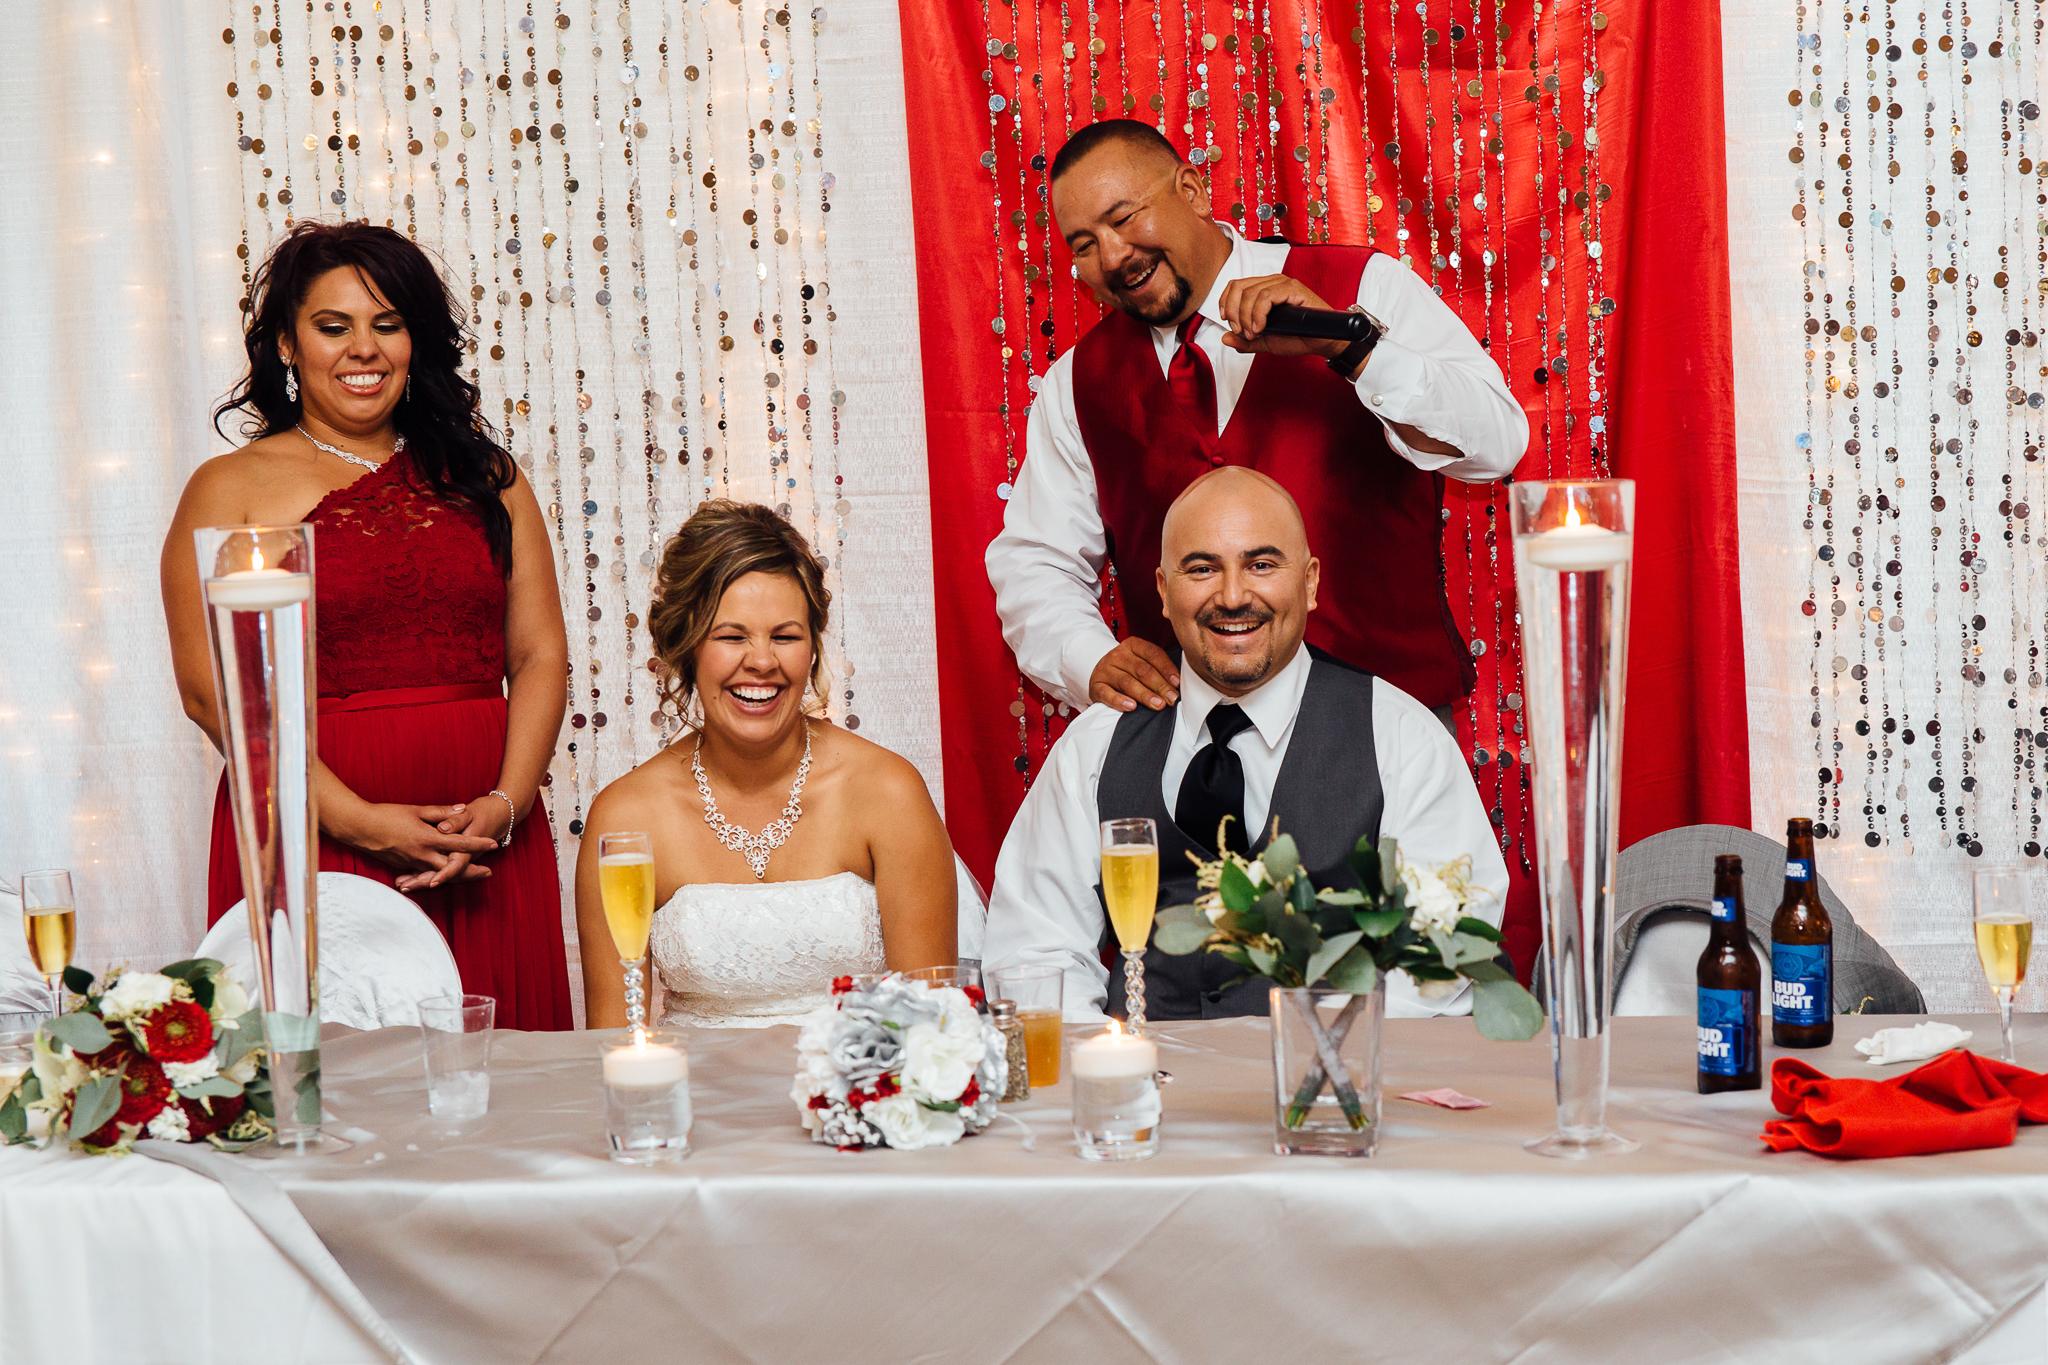 wedding-photographers-in-new-mexico-06.jpg